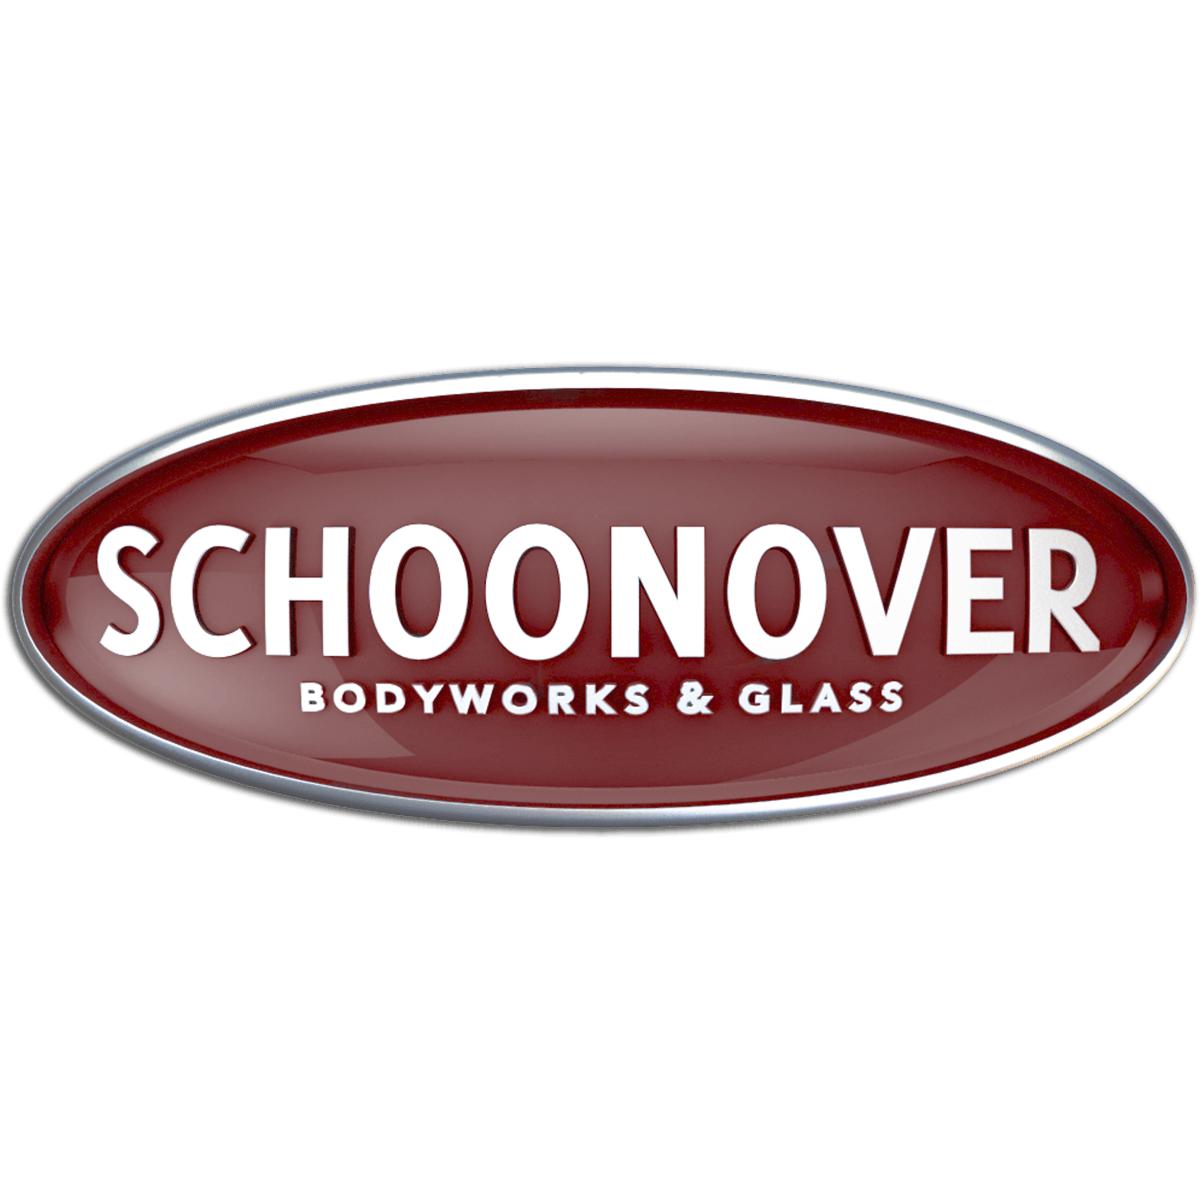 Schoonover Bodyworks & Glass